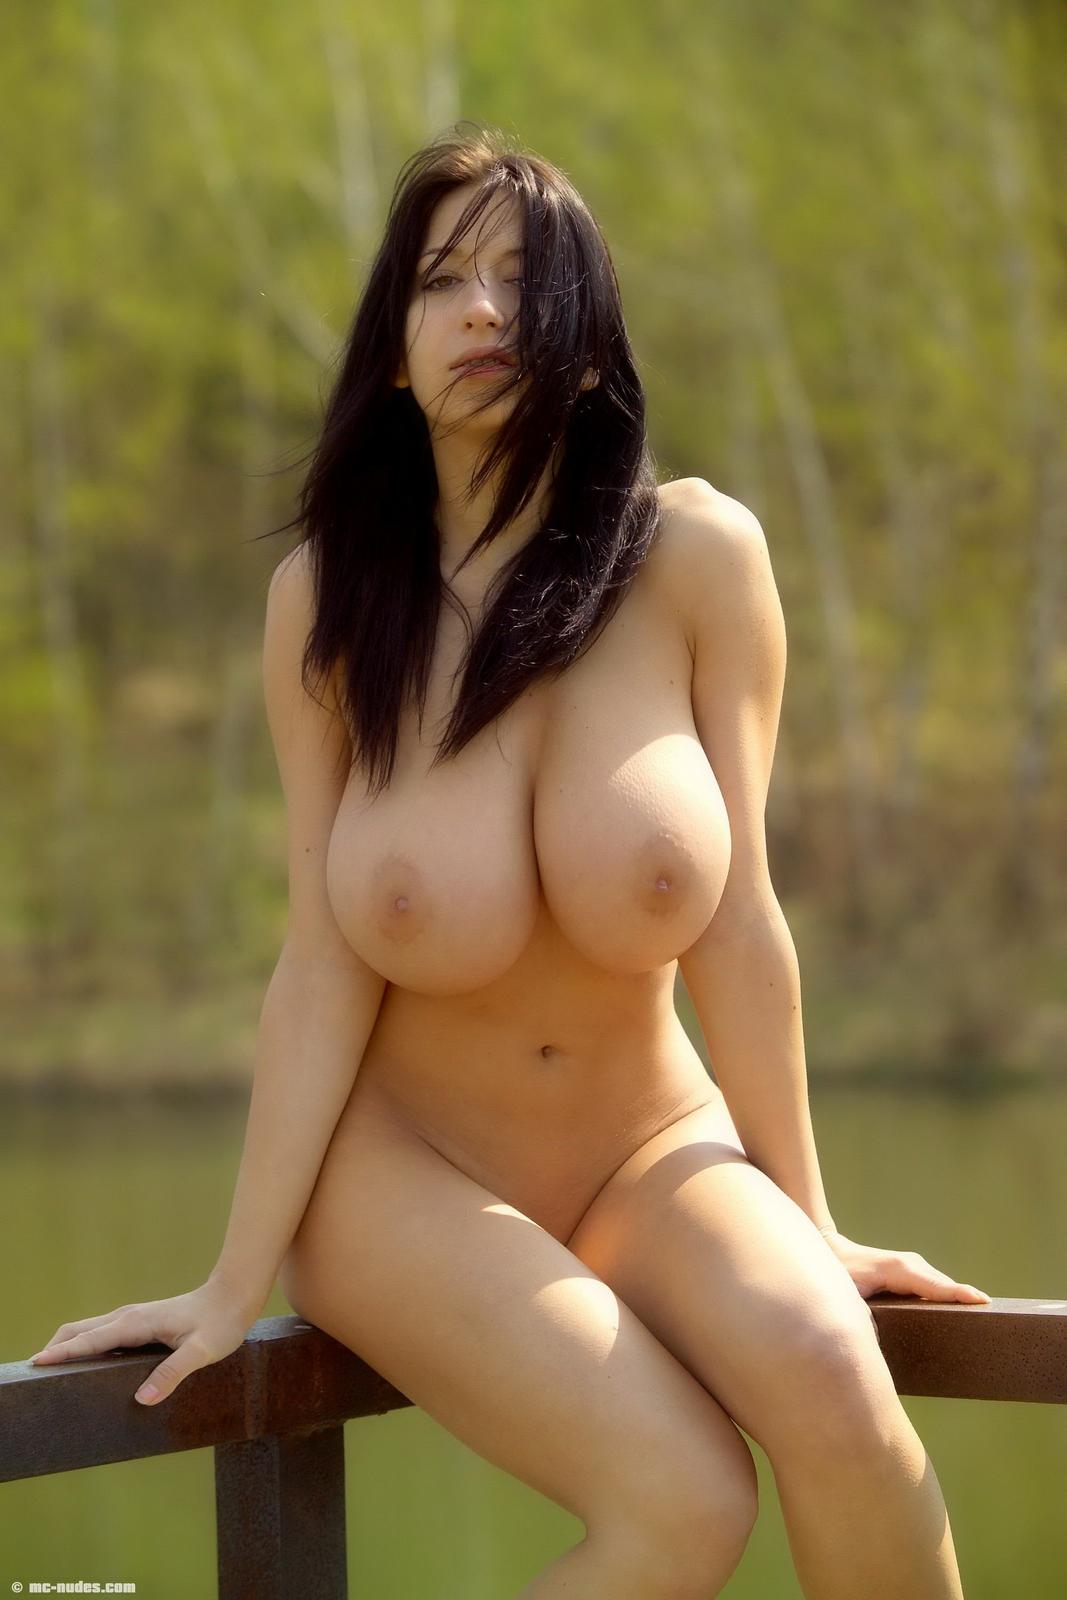 princessa-huge-tits-lake-brunette-naked-mcnudes-23